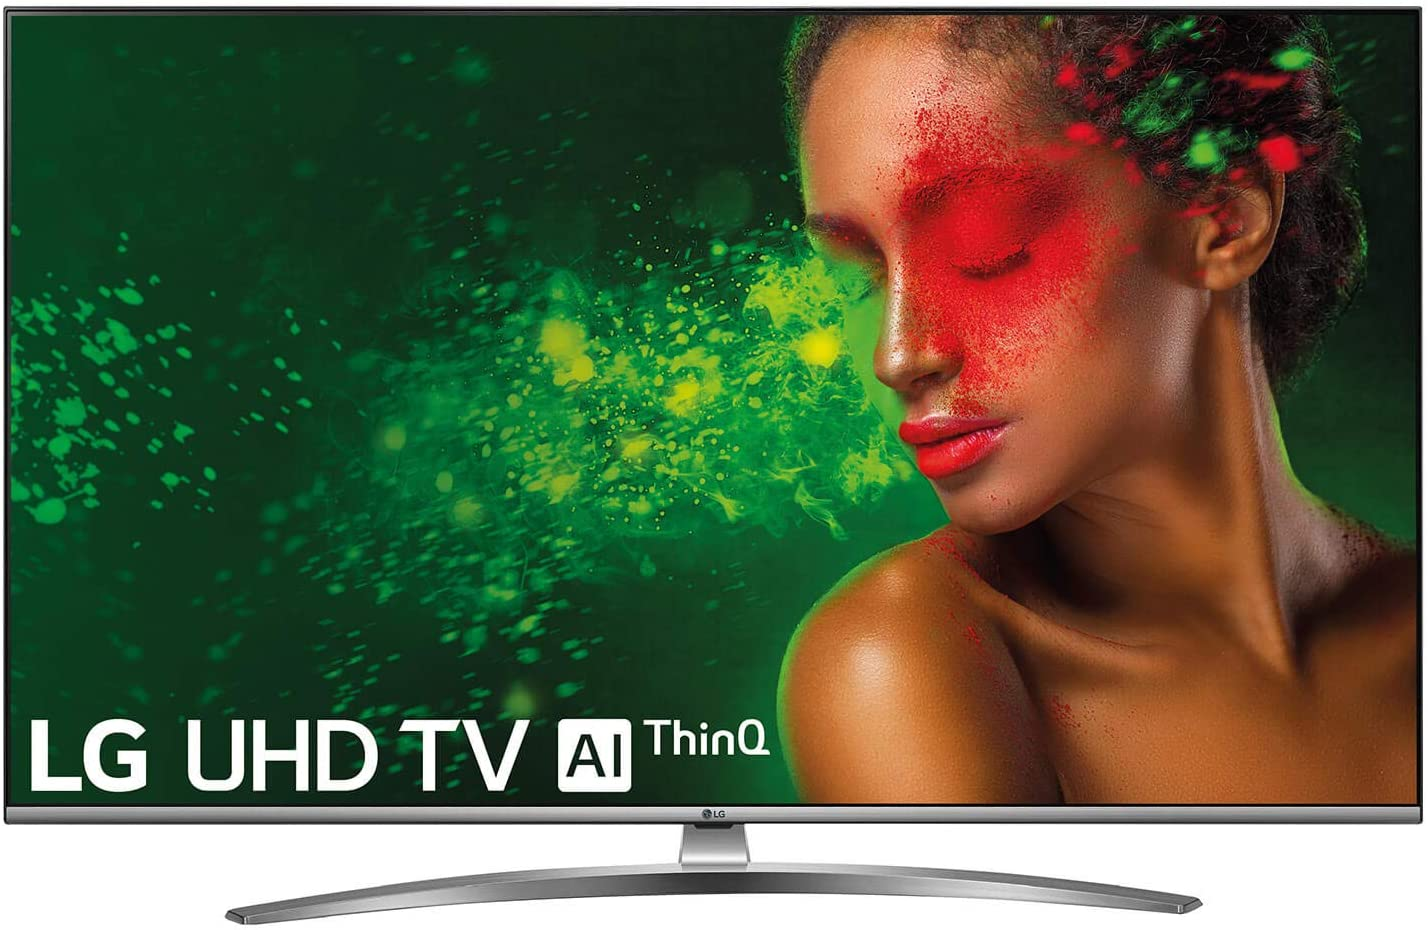 "LG 55UM7610PLB - Smart TV 4K UHD de 139 cm (55"") con Alexa Integrada, Inteligencia Artificial (Panel IPS, HDR, webOS 4.5, Asistente de Google, Procesador Quad Core, Sonido DTS Virtual:X) Color Acero [Clase de eficiencia energética A]"